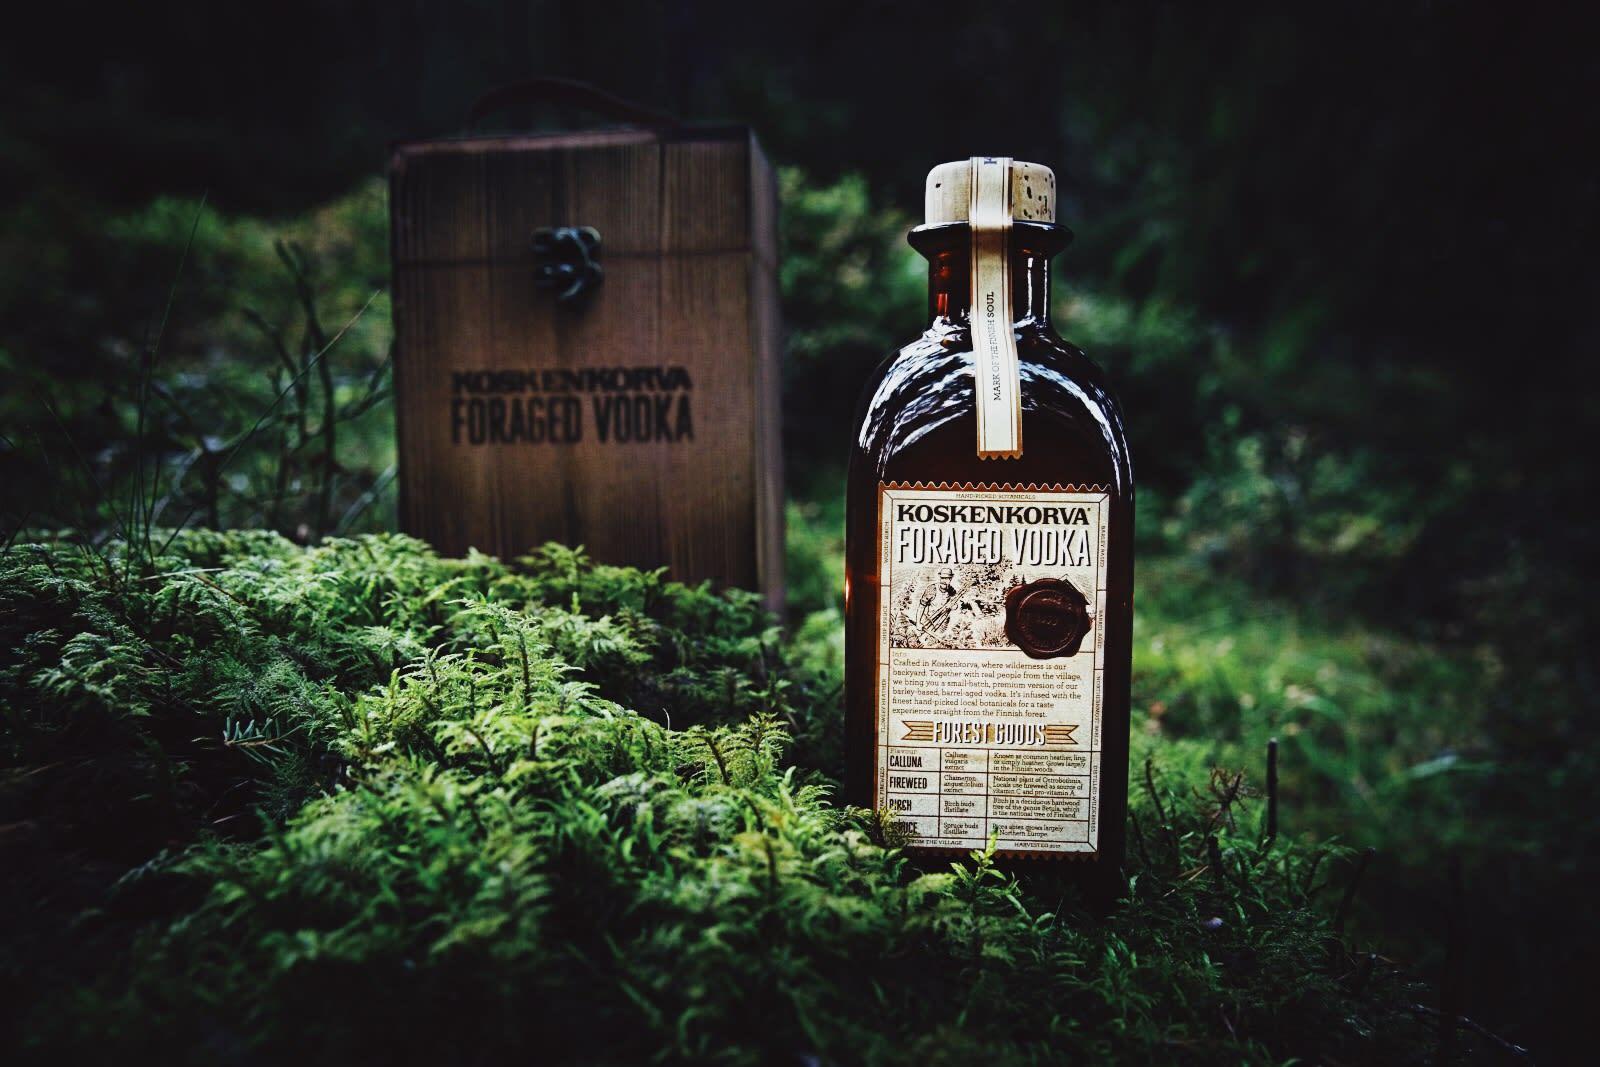 Koskenkorva foraged vodka